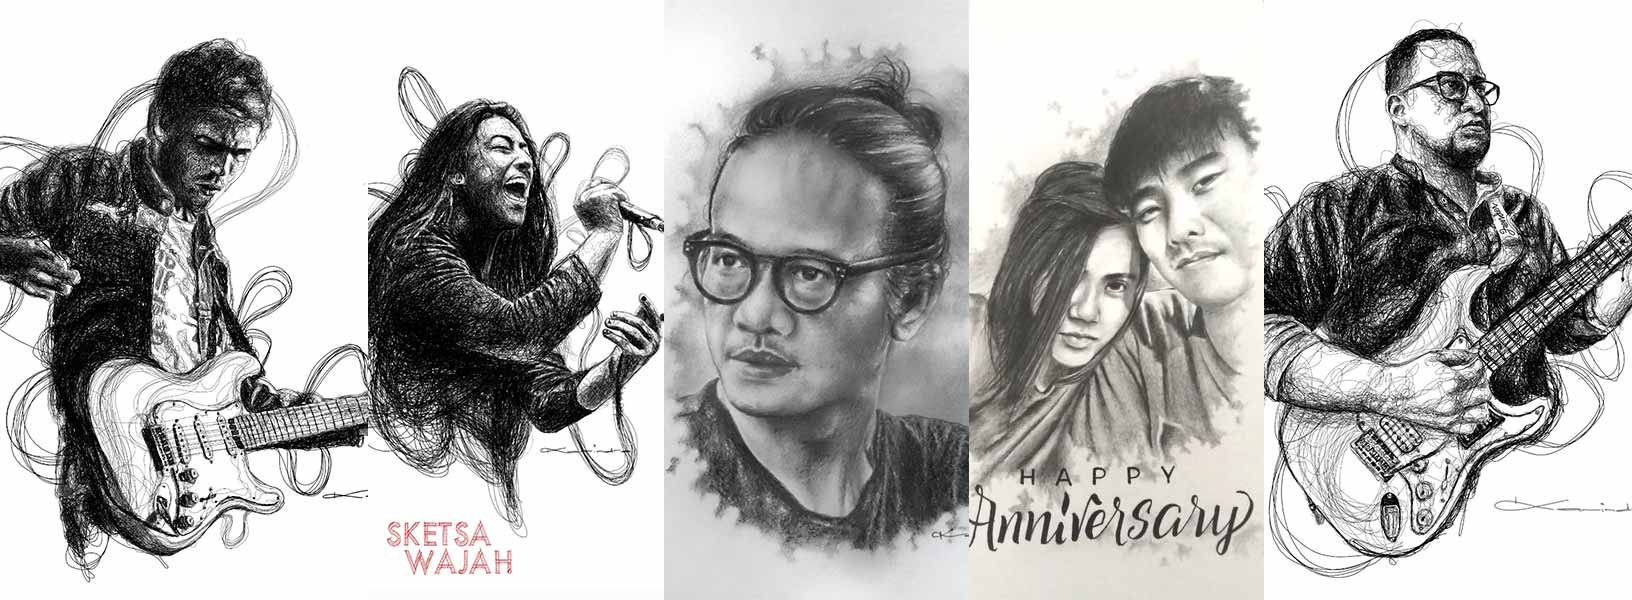 Karya Karindra Yudhanegara sketcher Sketsa Wajah